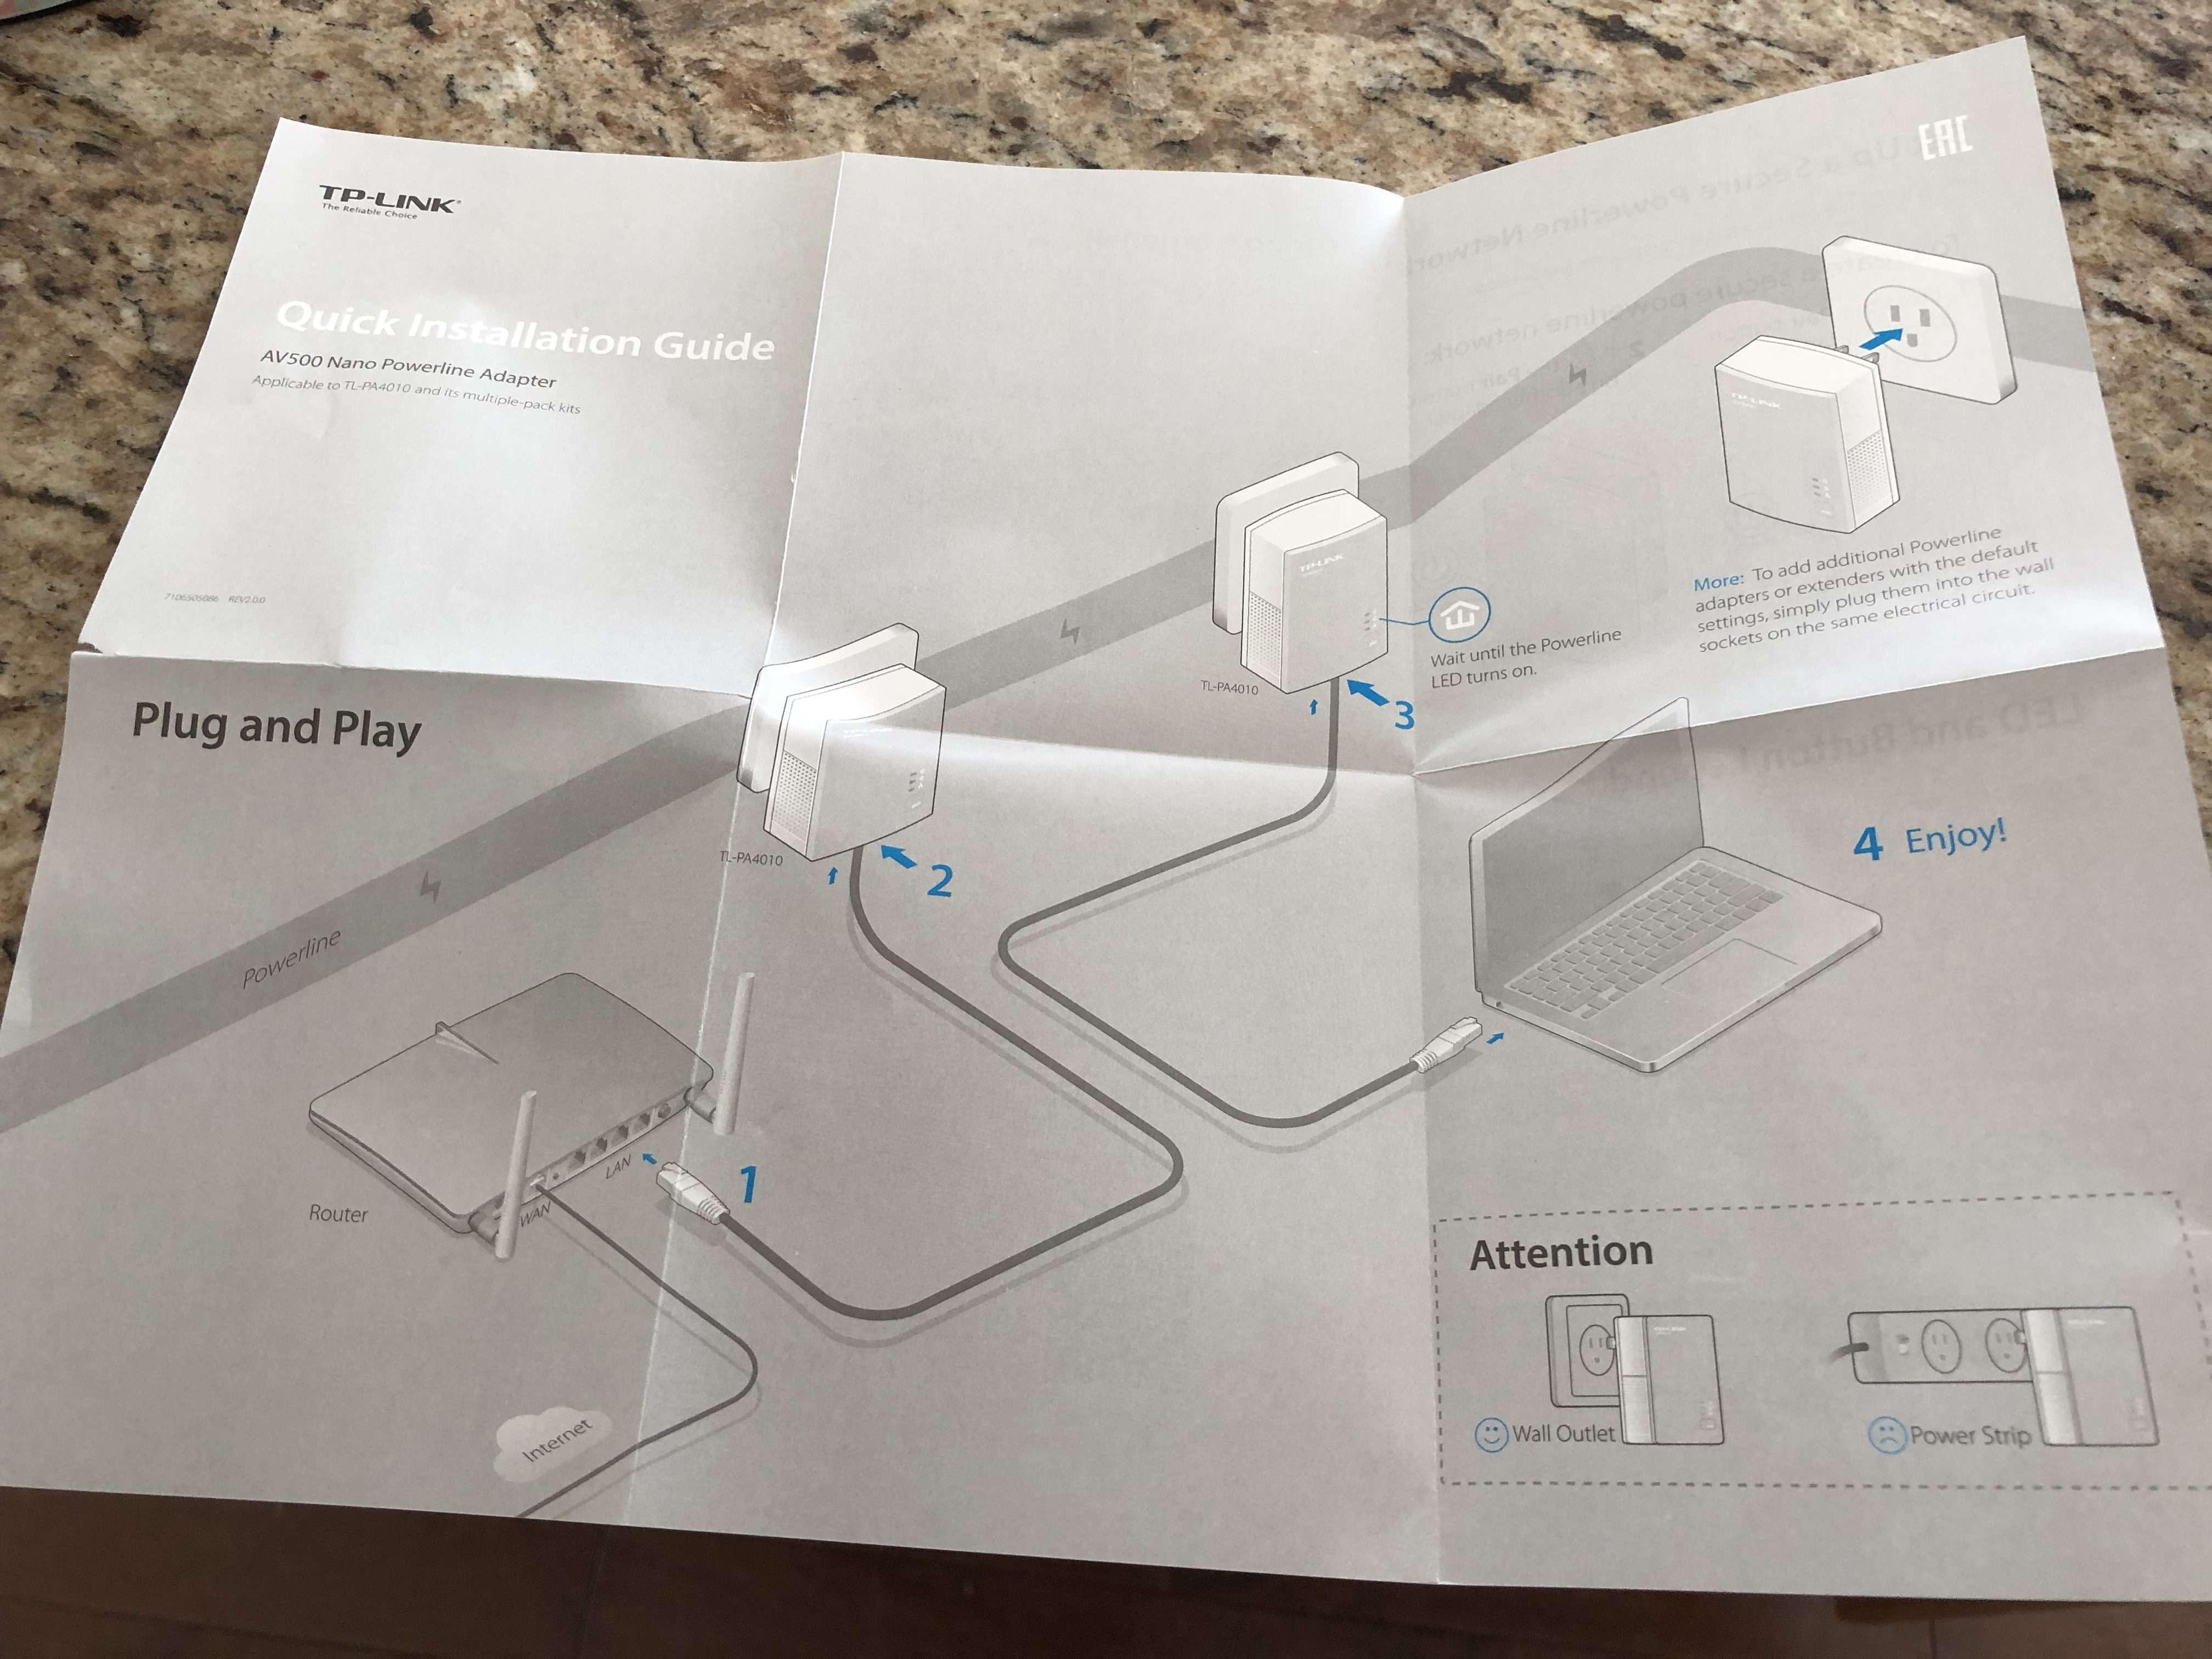 Cheap solution for WiFi dead spots - TP-Link PowerLine Ethernet